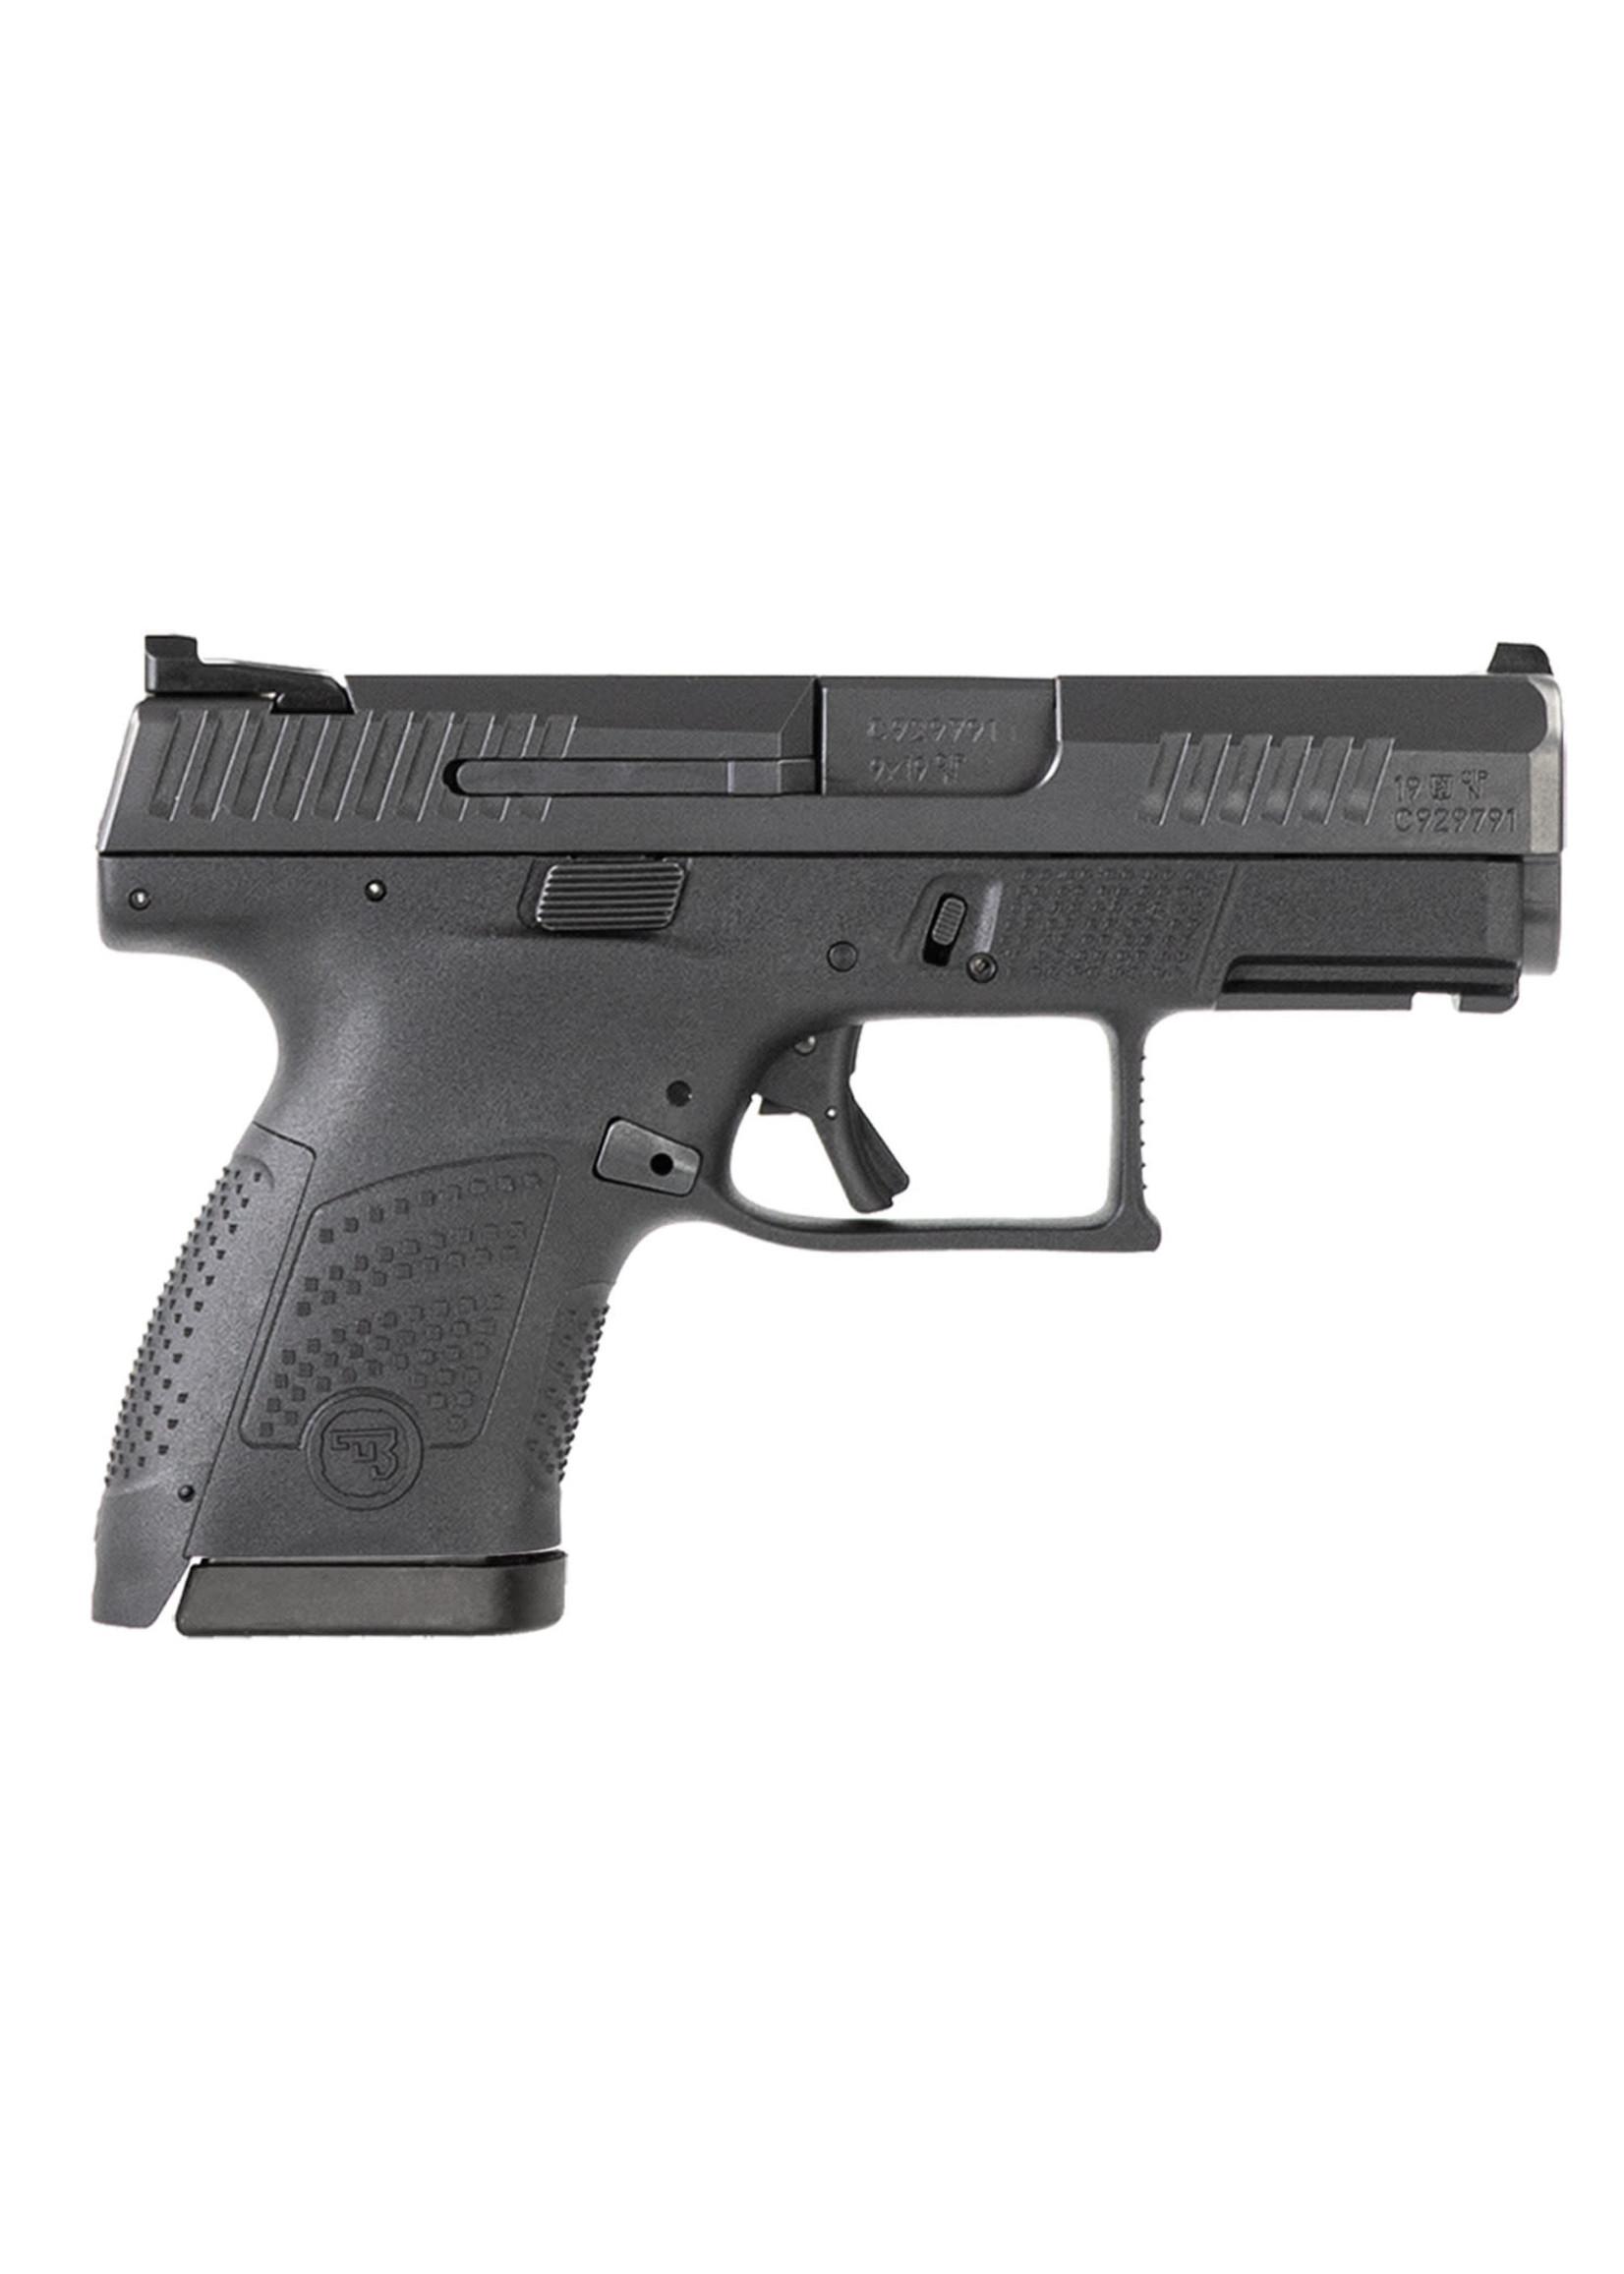 "CZ USA CZ 91560 P-10 S 9mm Luger 3.50"" 12+1 Black Black Steel Slide Black Interchangeable Backstrap Grip Reversible Mag Release"